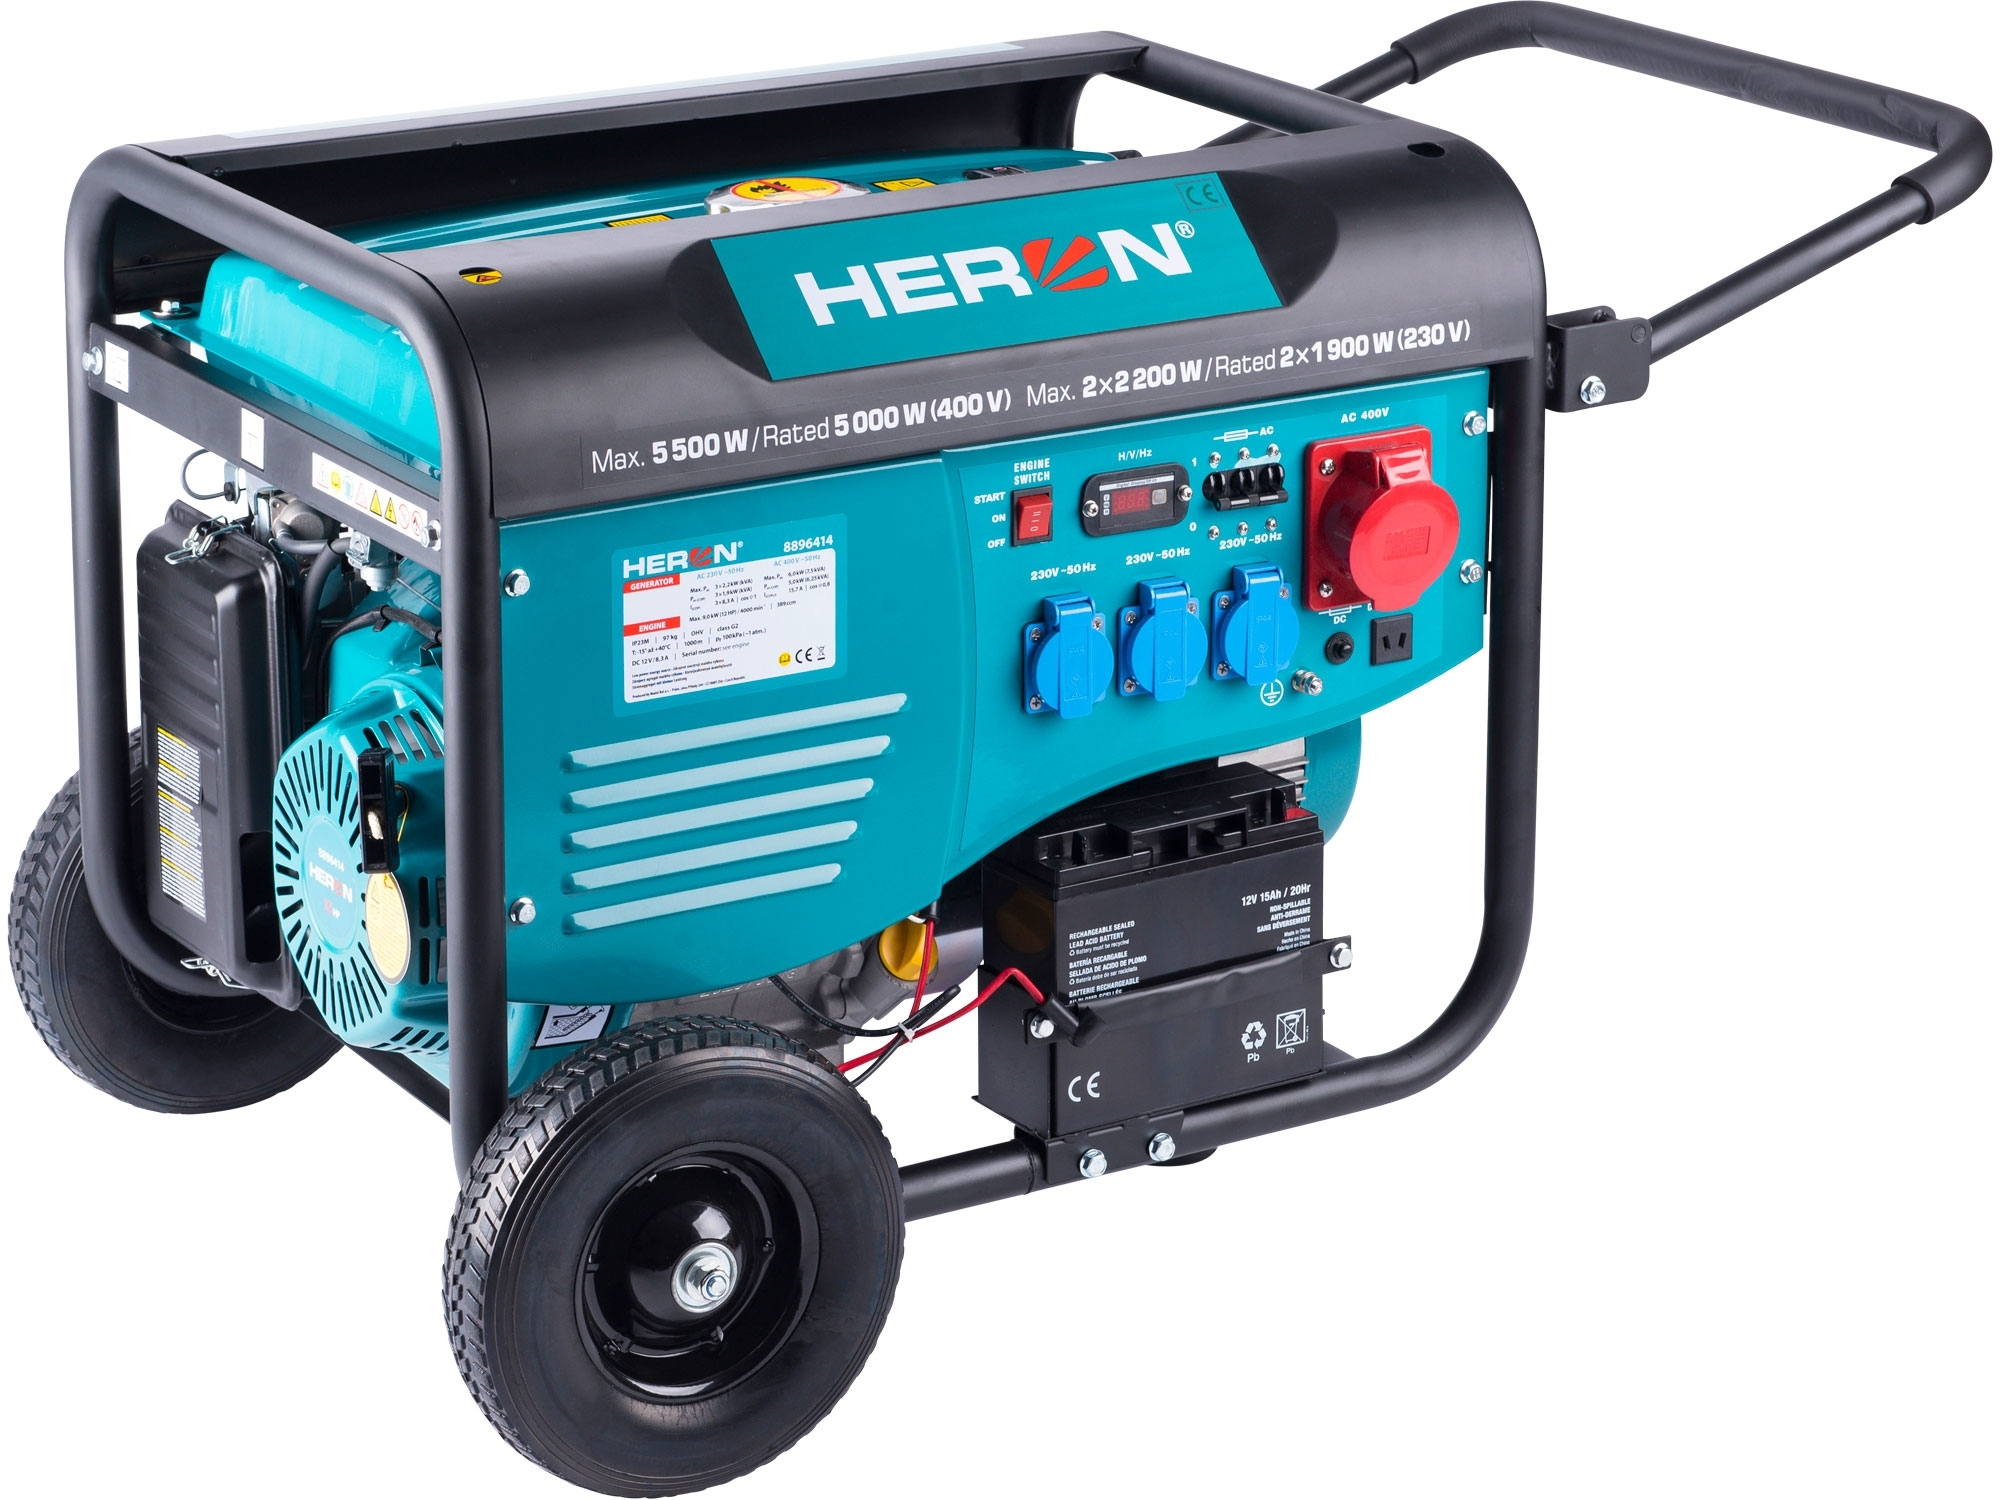 HERON elektrocentrála benzínová 13HP/5,5kW/6,8kVA (400V), 2x2,2kW (230V), elektrický start, podvozek